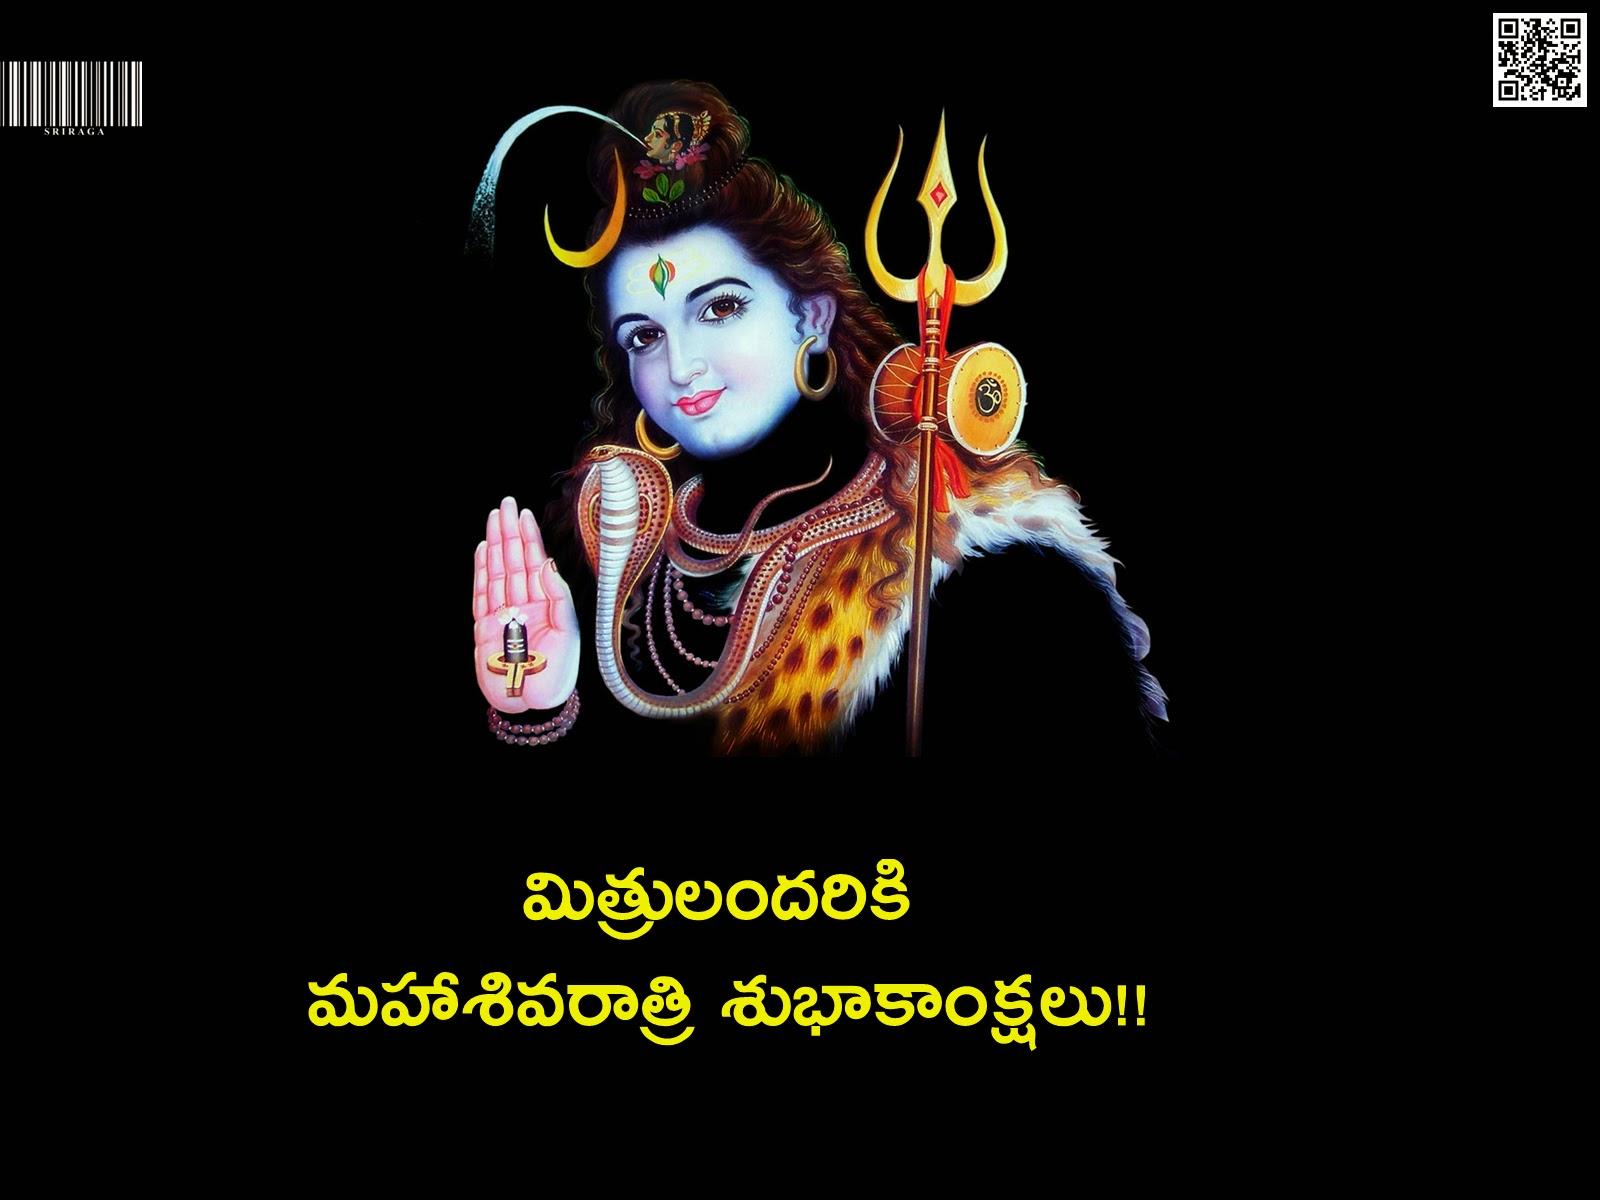 Maha Shivaratri Telugu Festival Wishes Greetings Images HDwallpapers మహాశివరాత్రి శుభాకాంక్షలు